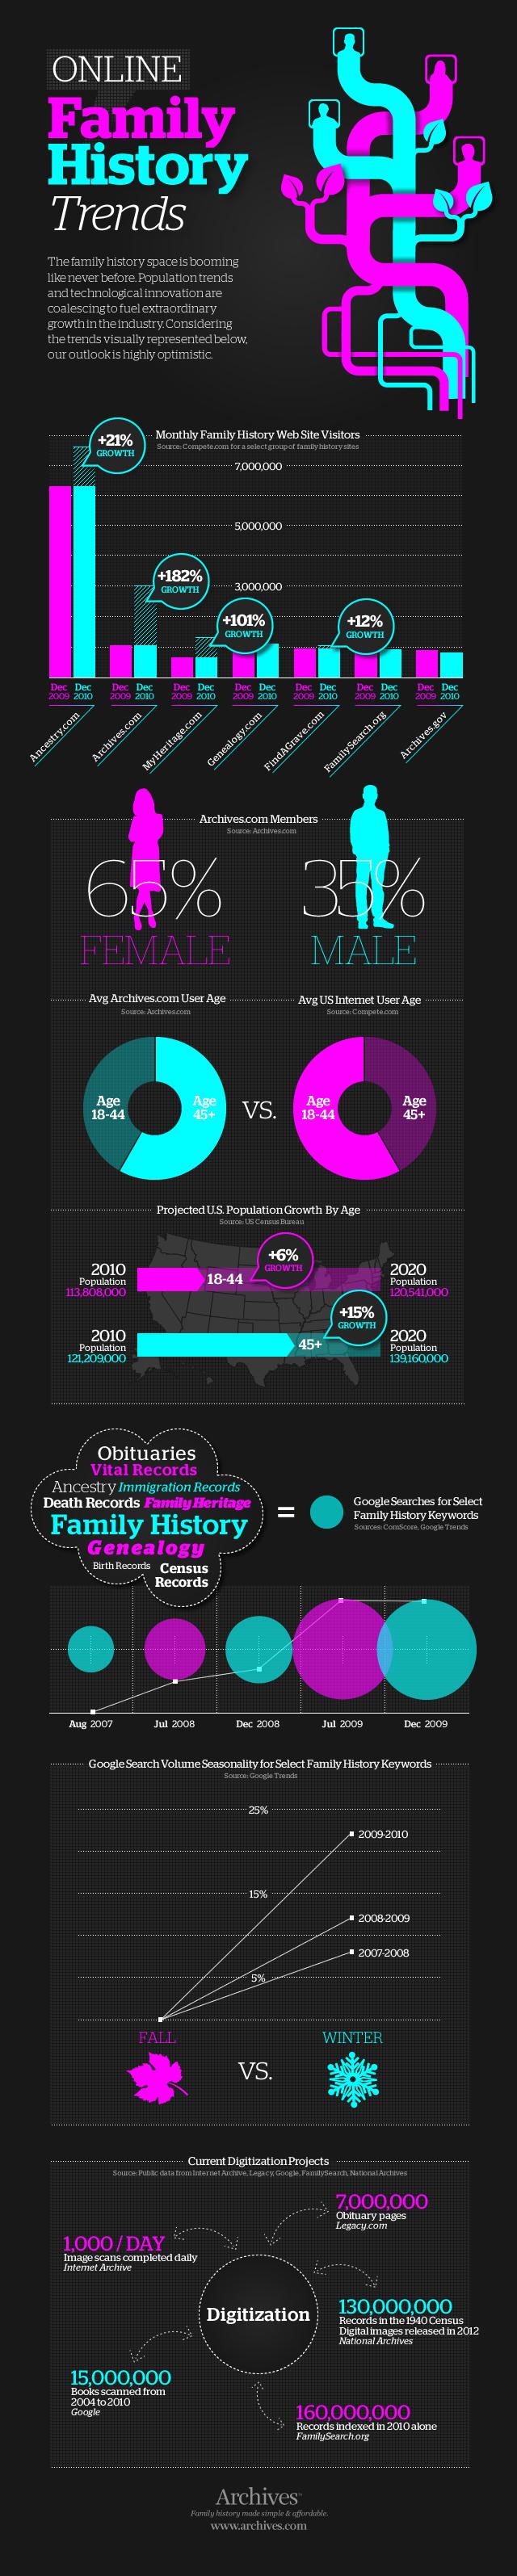 trends_infographic.jpg